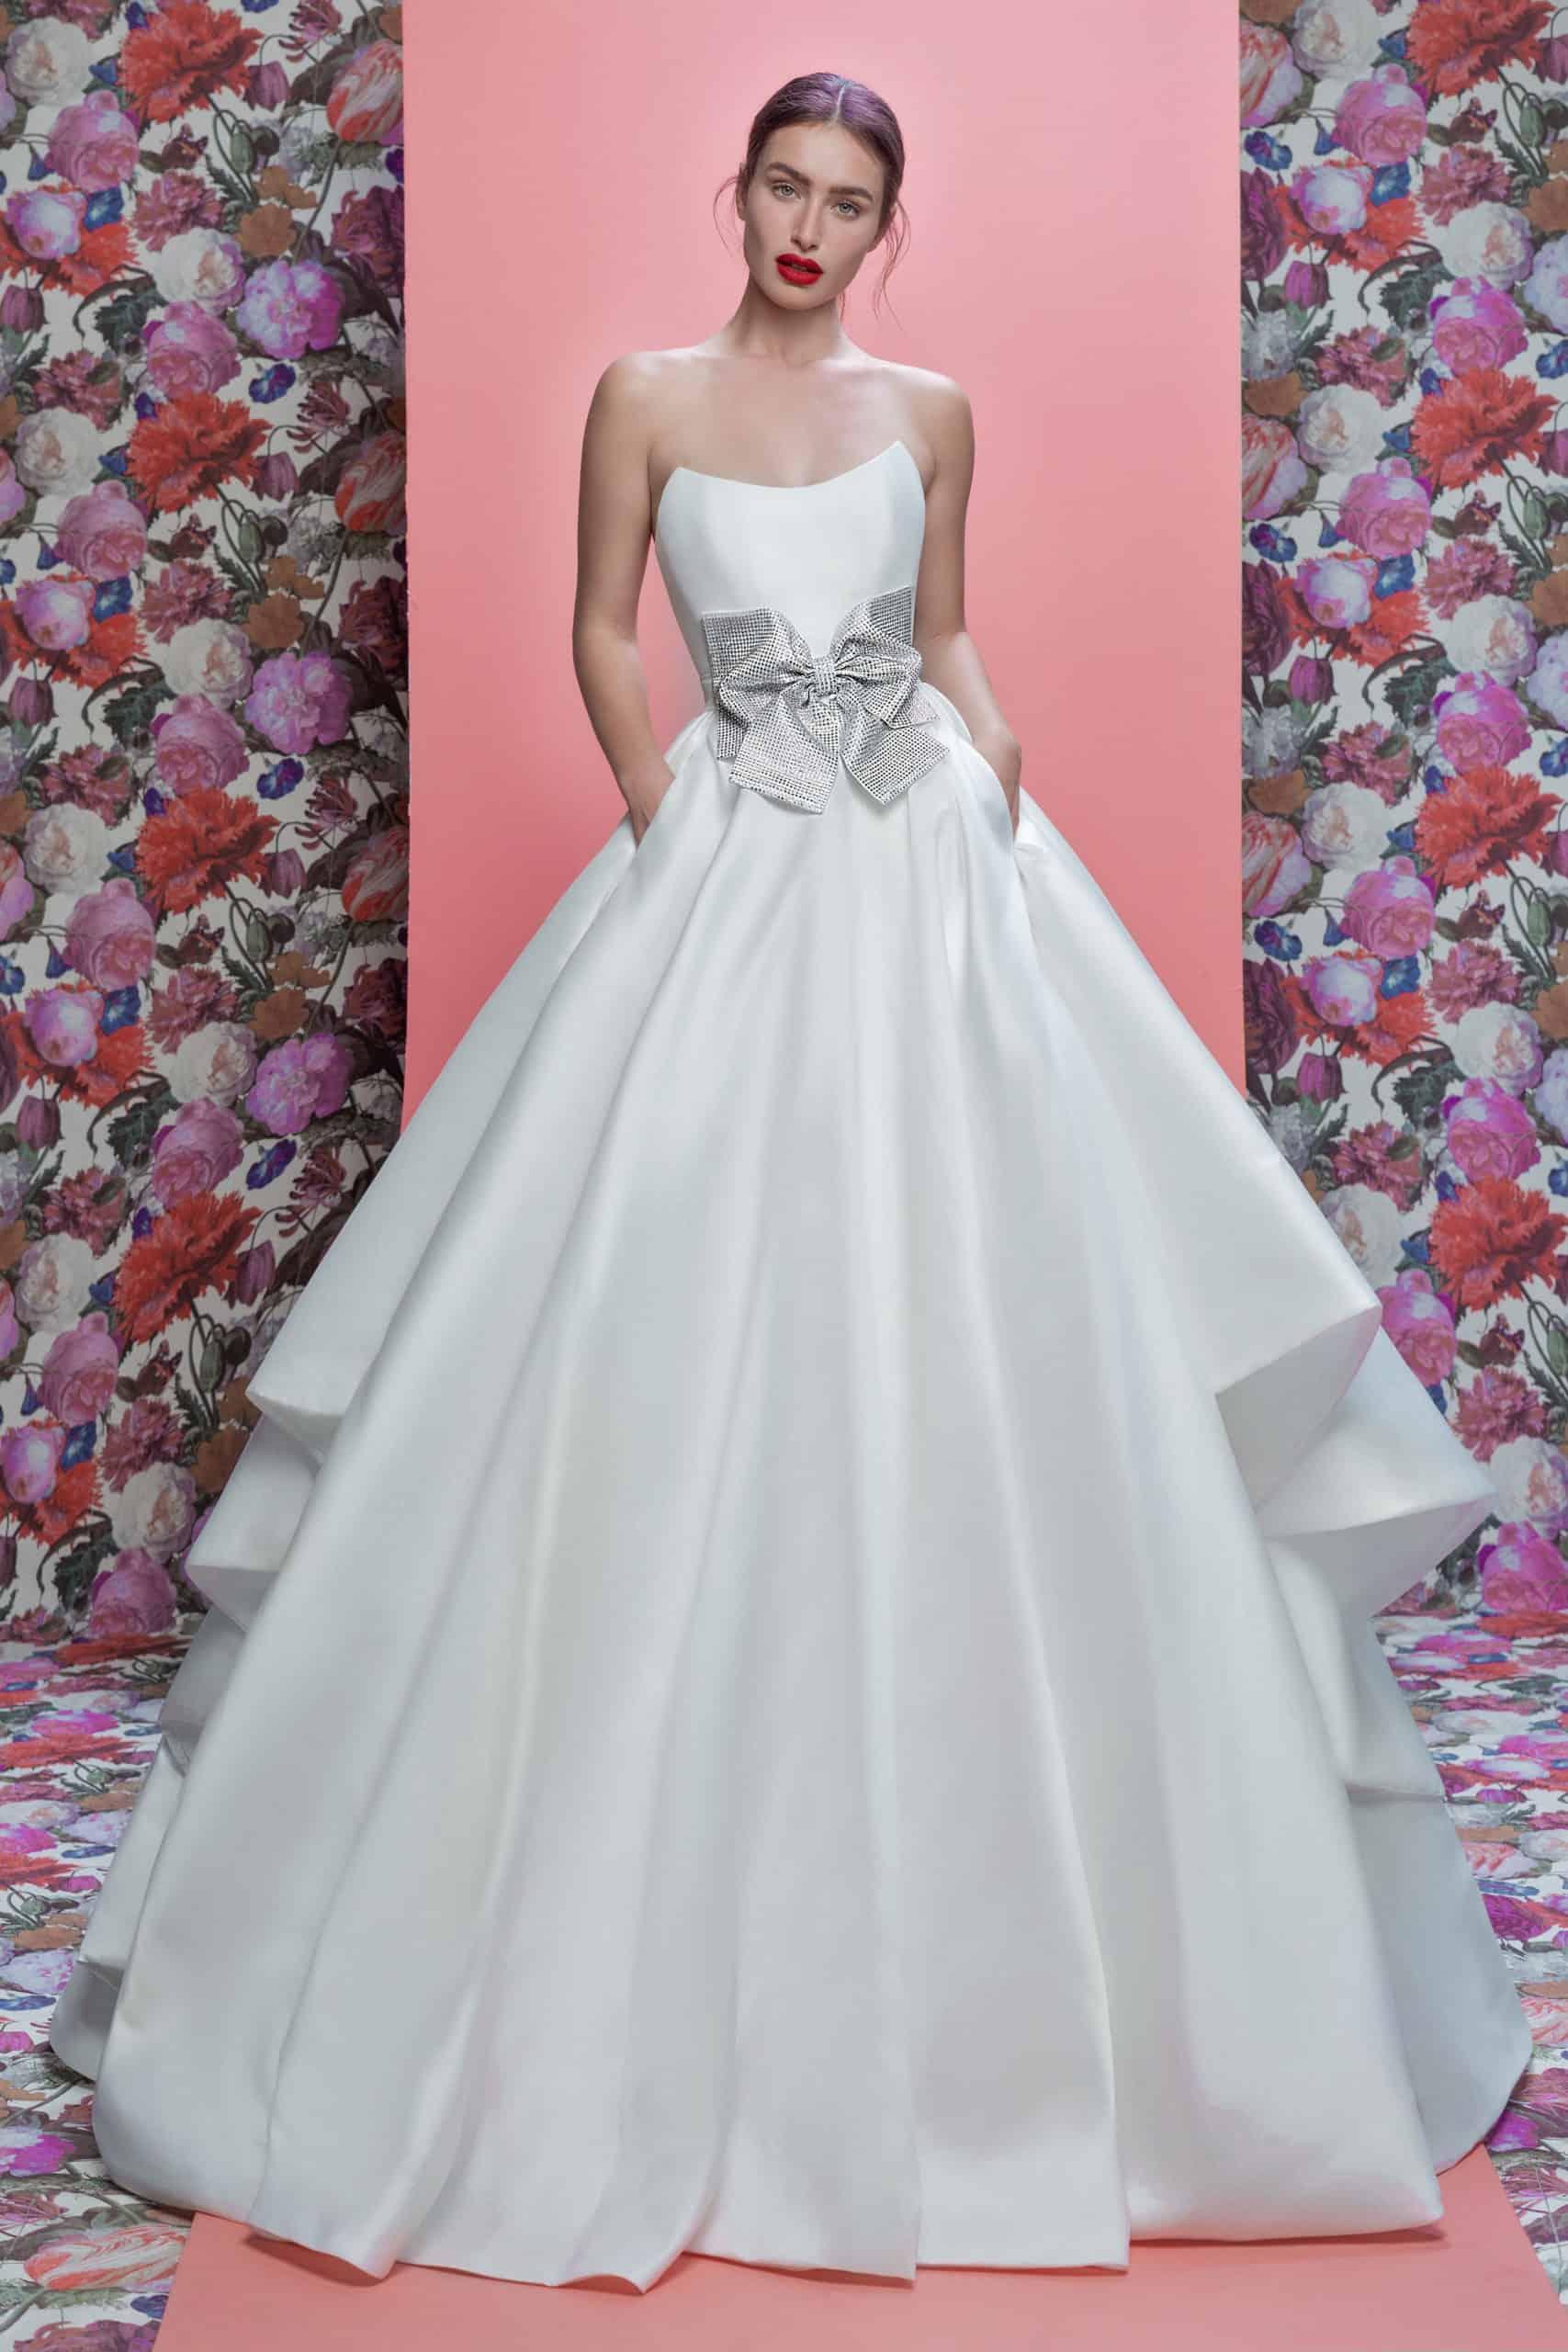 a princess style wedding dress with a silver bow around the waist by Galia Lahav